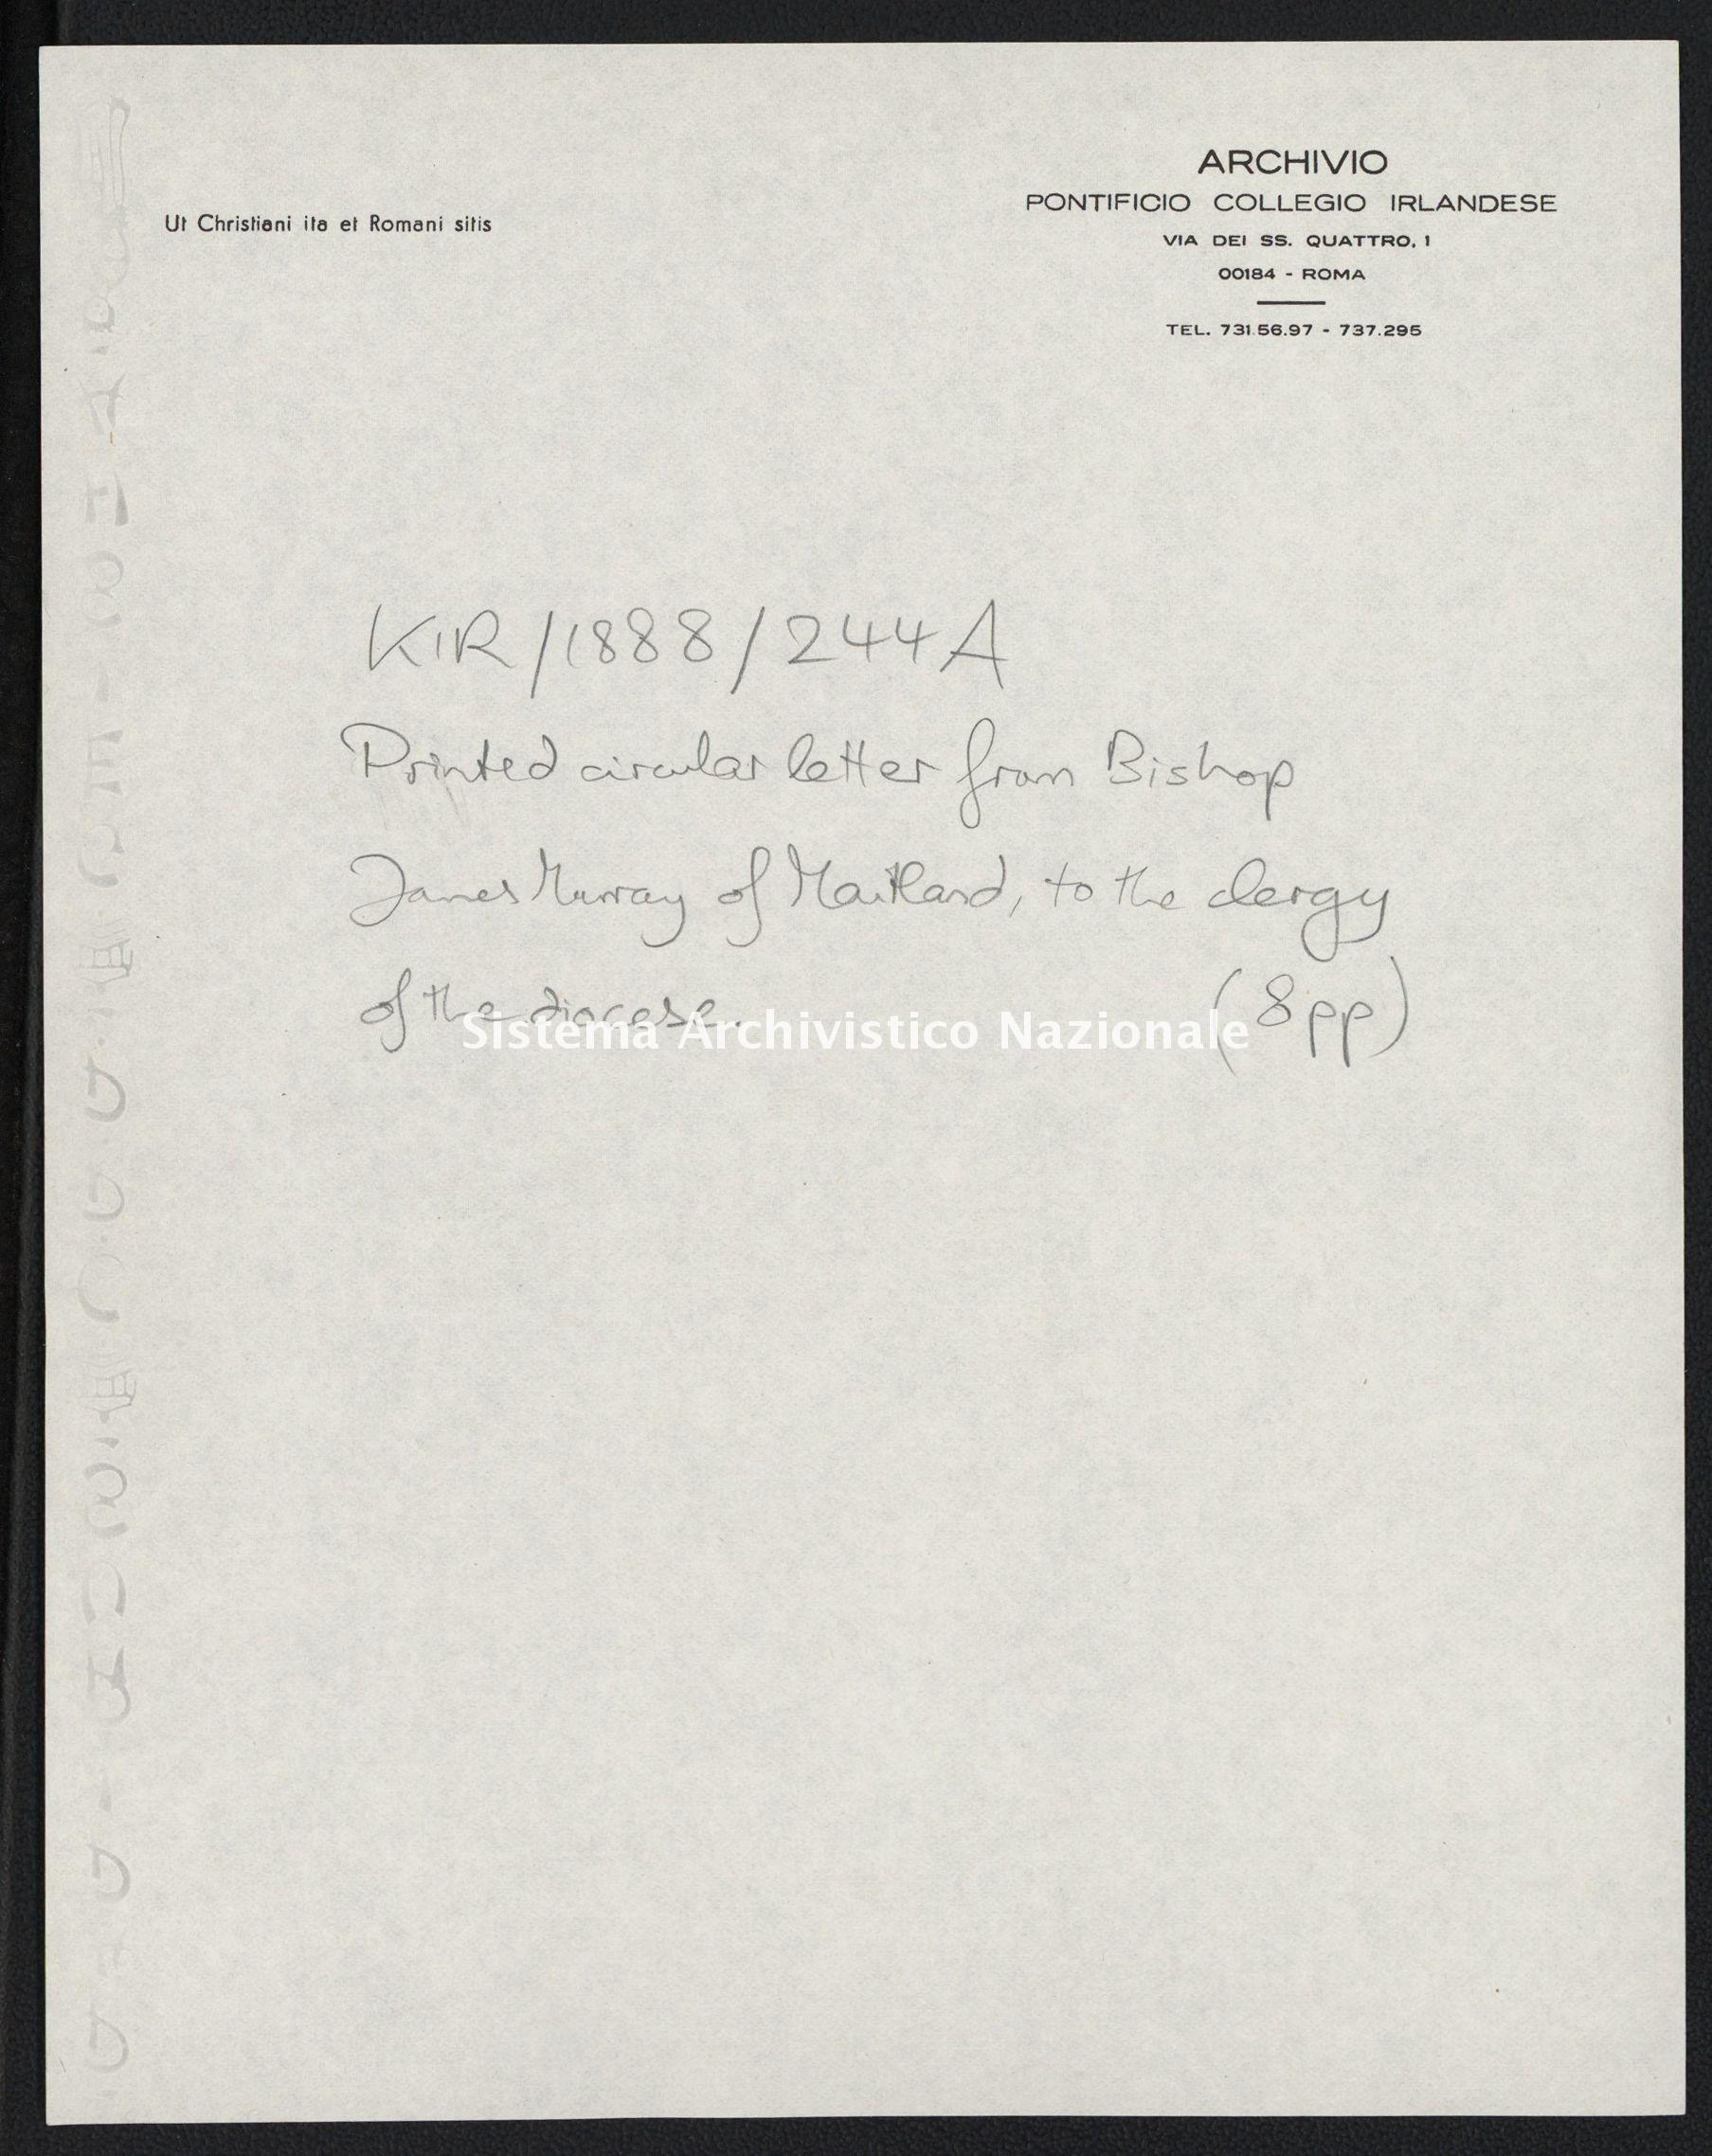 Pontificio Collegio Irlandese - Kirby_1888_244_a